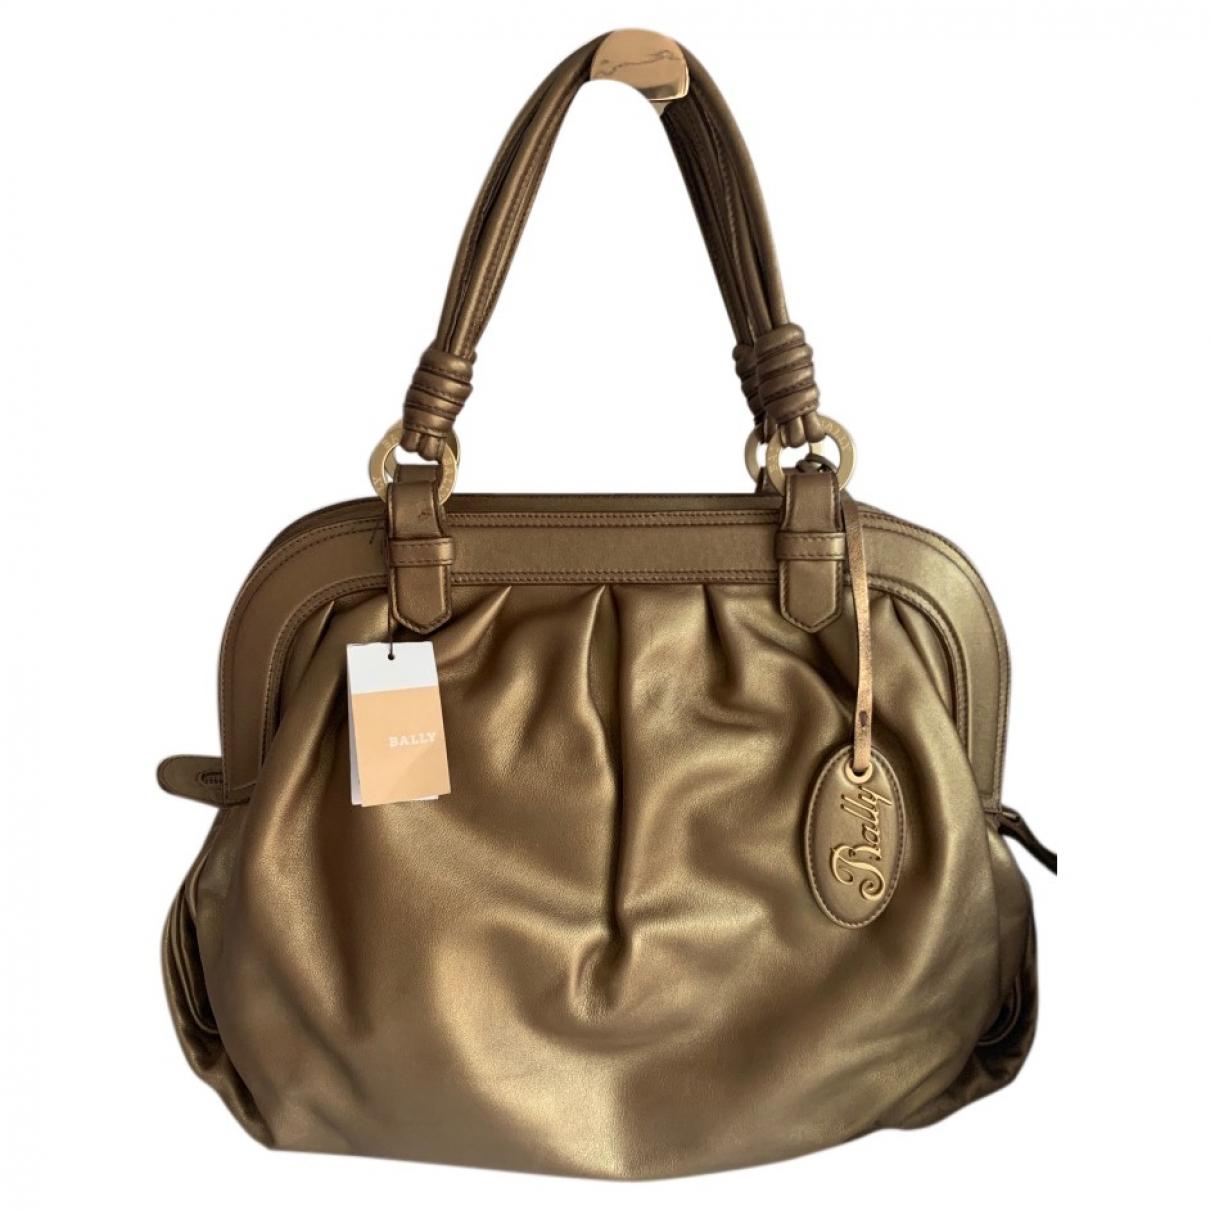 Bally \N Gold Leather handbag for Women \N